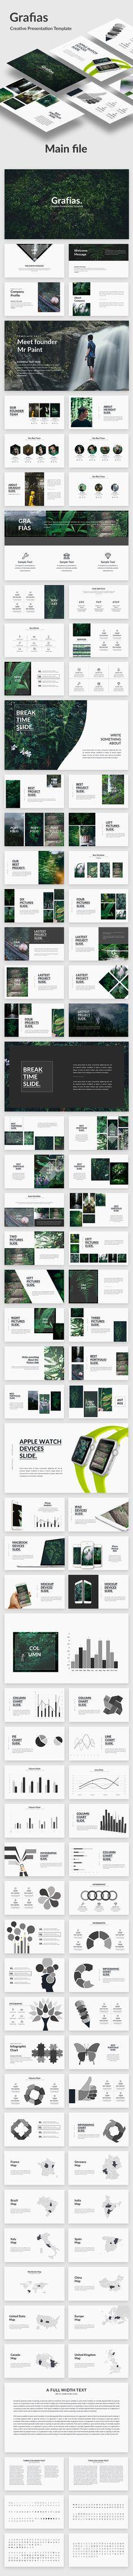 Grafias  Creative Keynote Template — Keynote KEY #creative #fashion • Download ➝ https://graphicriver.net/item/grafias-creative-keynote-template/19771991?ref=pxcr